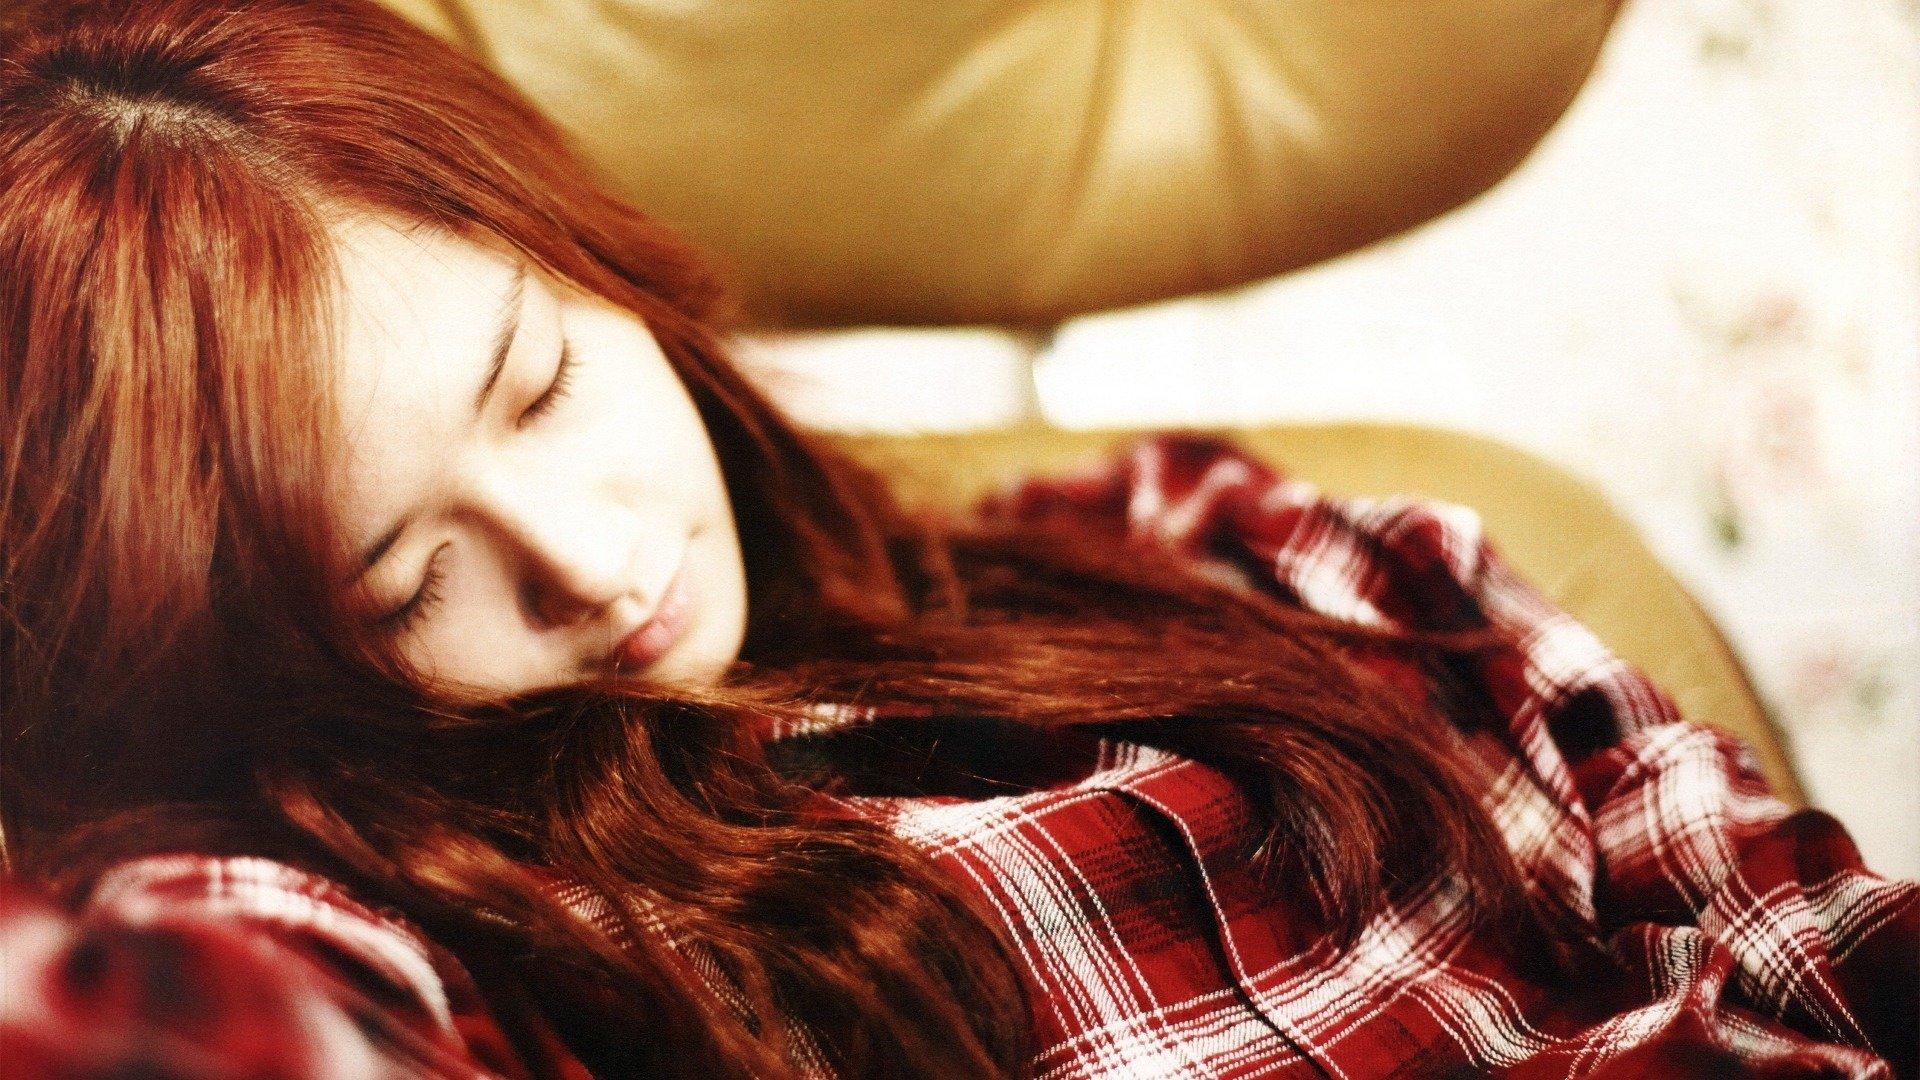 18 Im Yoona HD Wallpapers